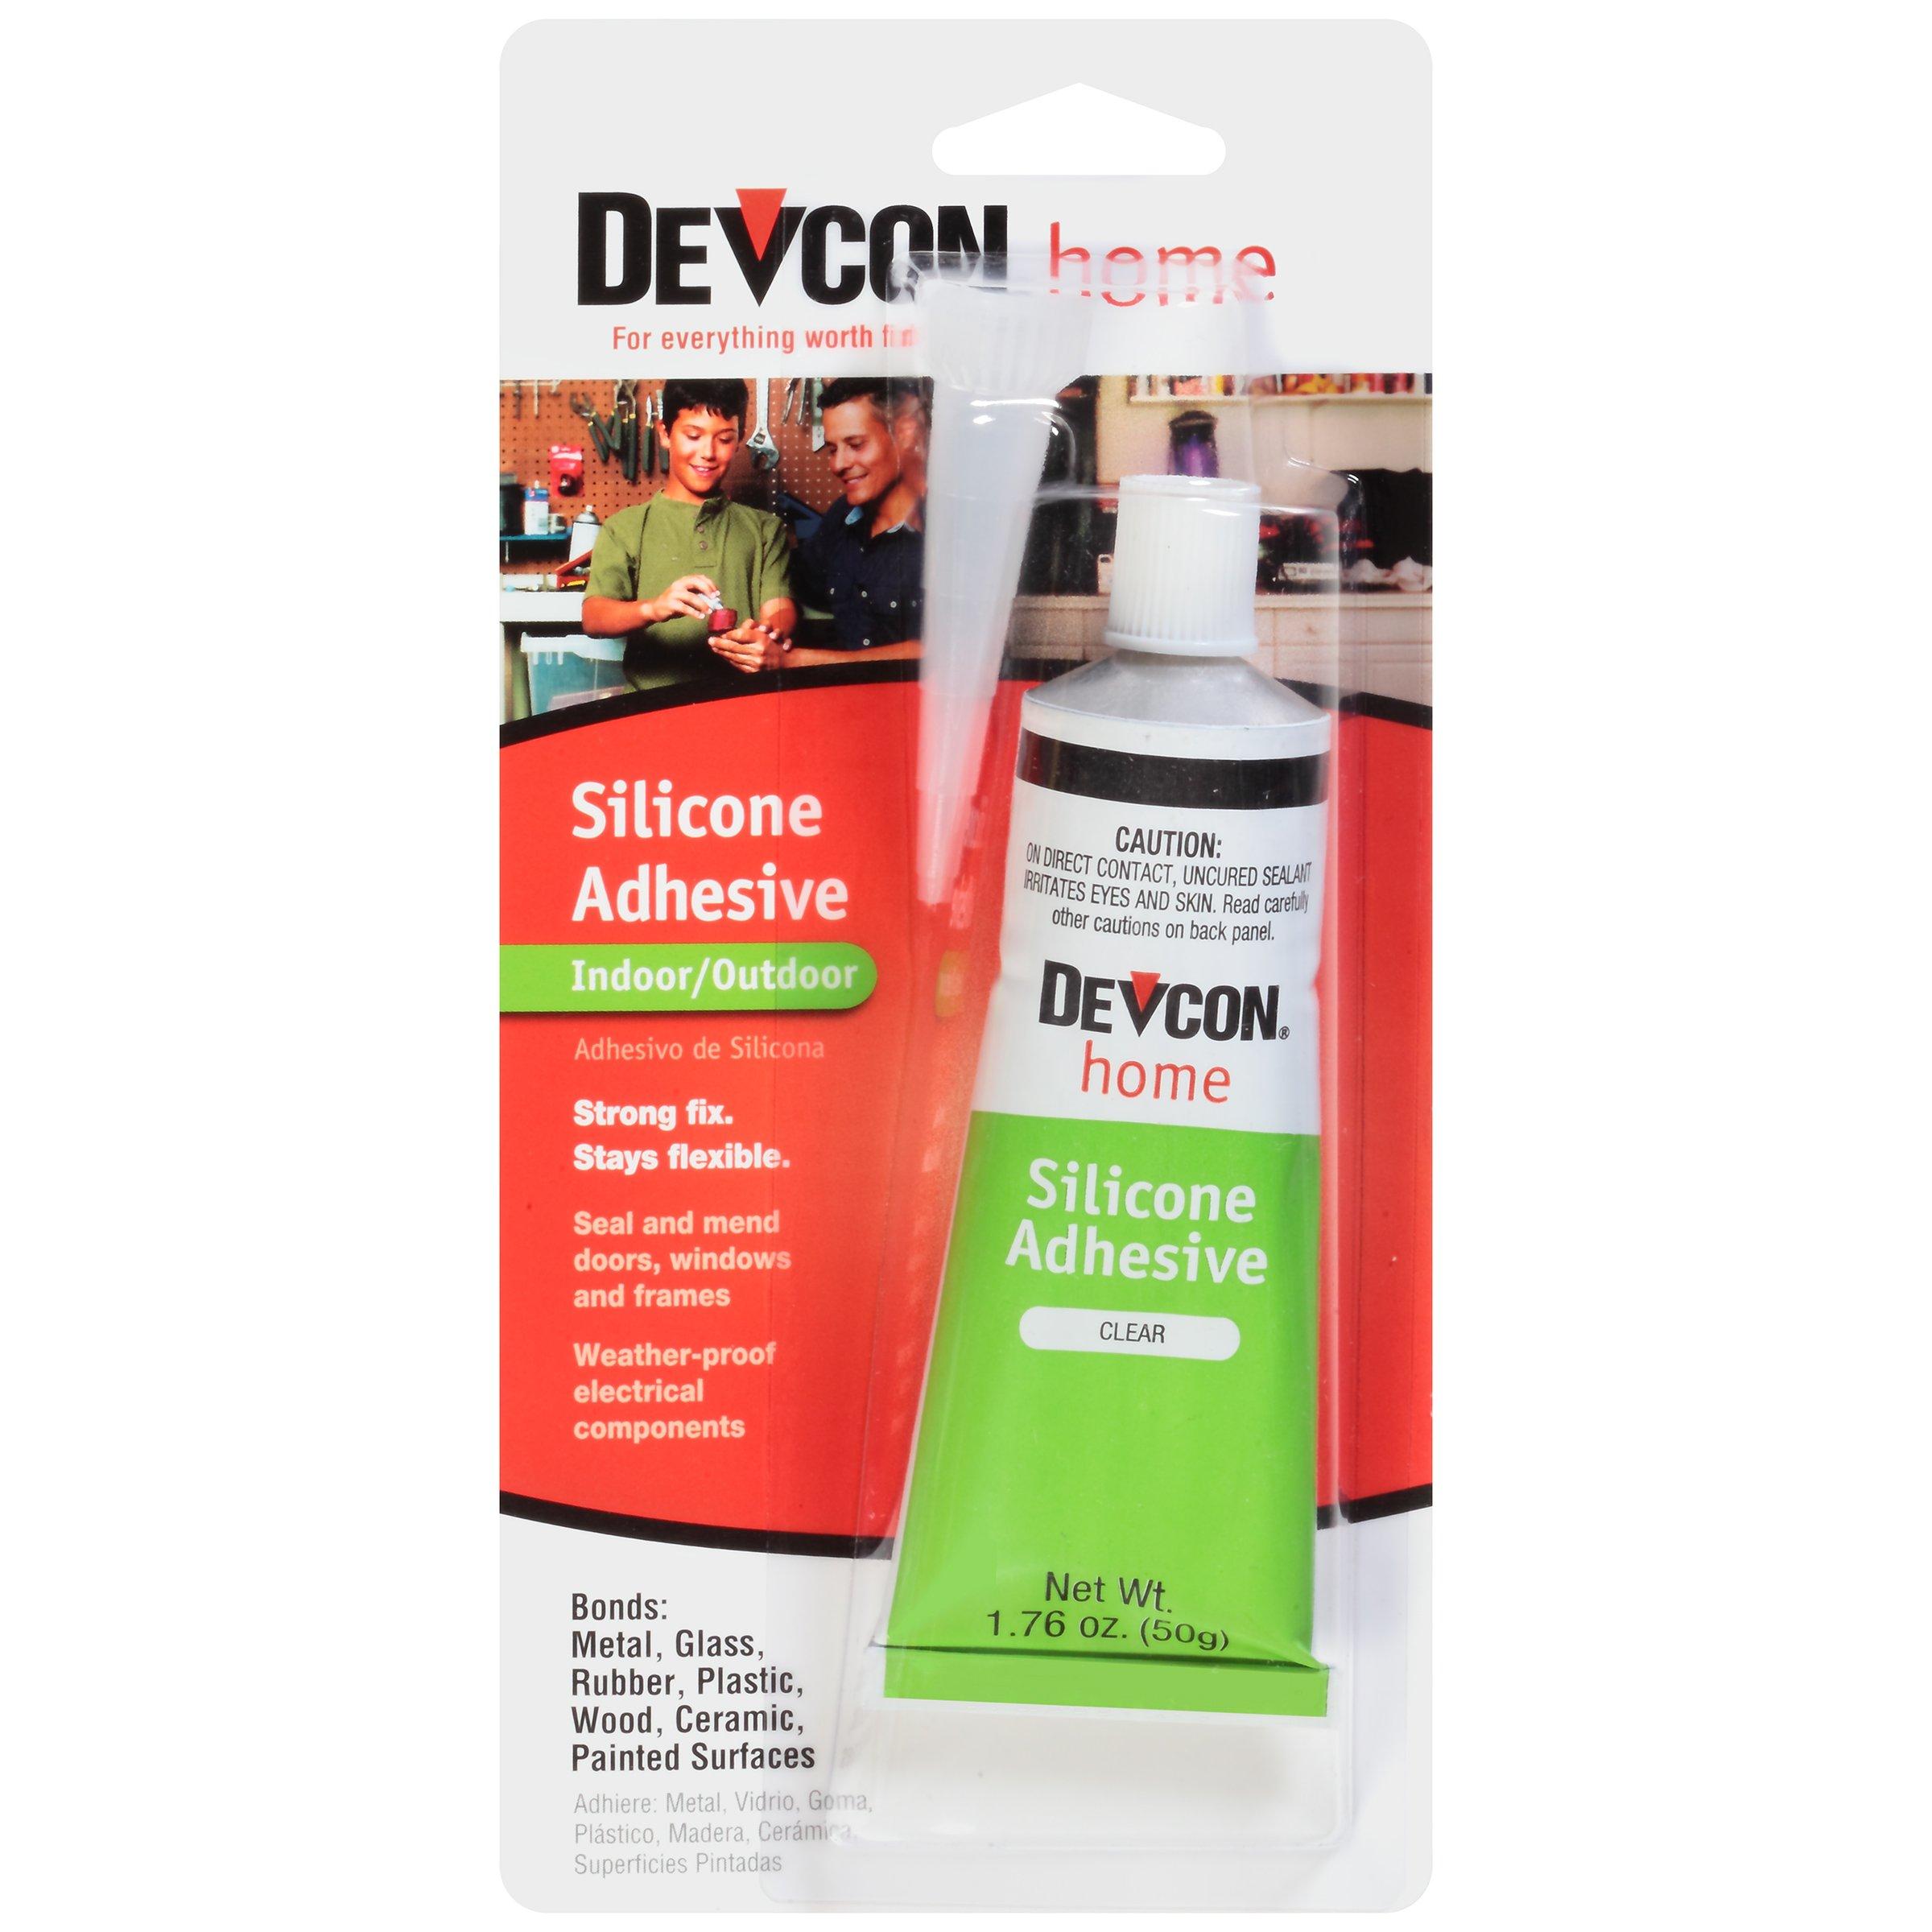 Devcon (12045-12PK) Premium Silicone Adhesive - 1.76 oz. (Pack of 12) by Devcon